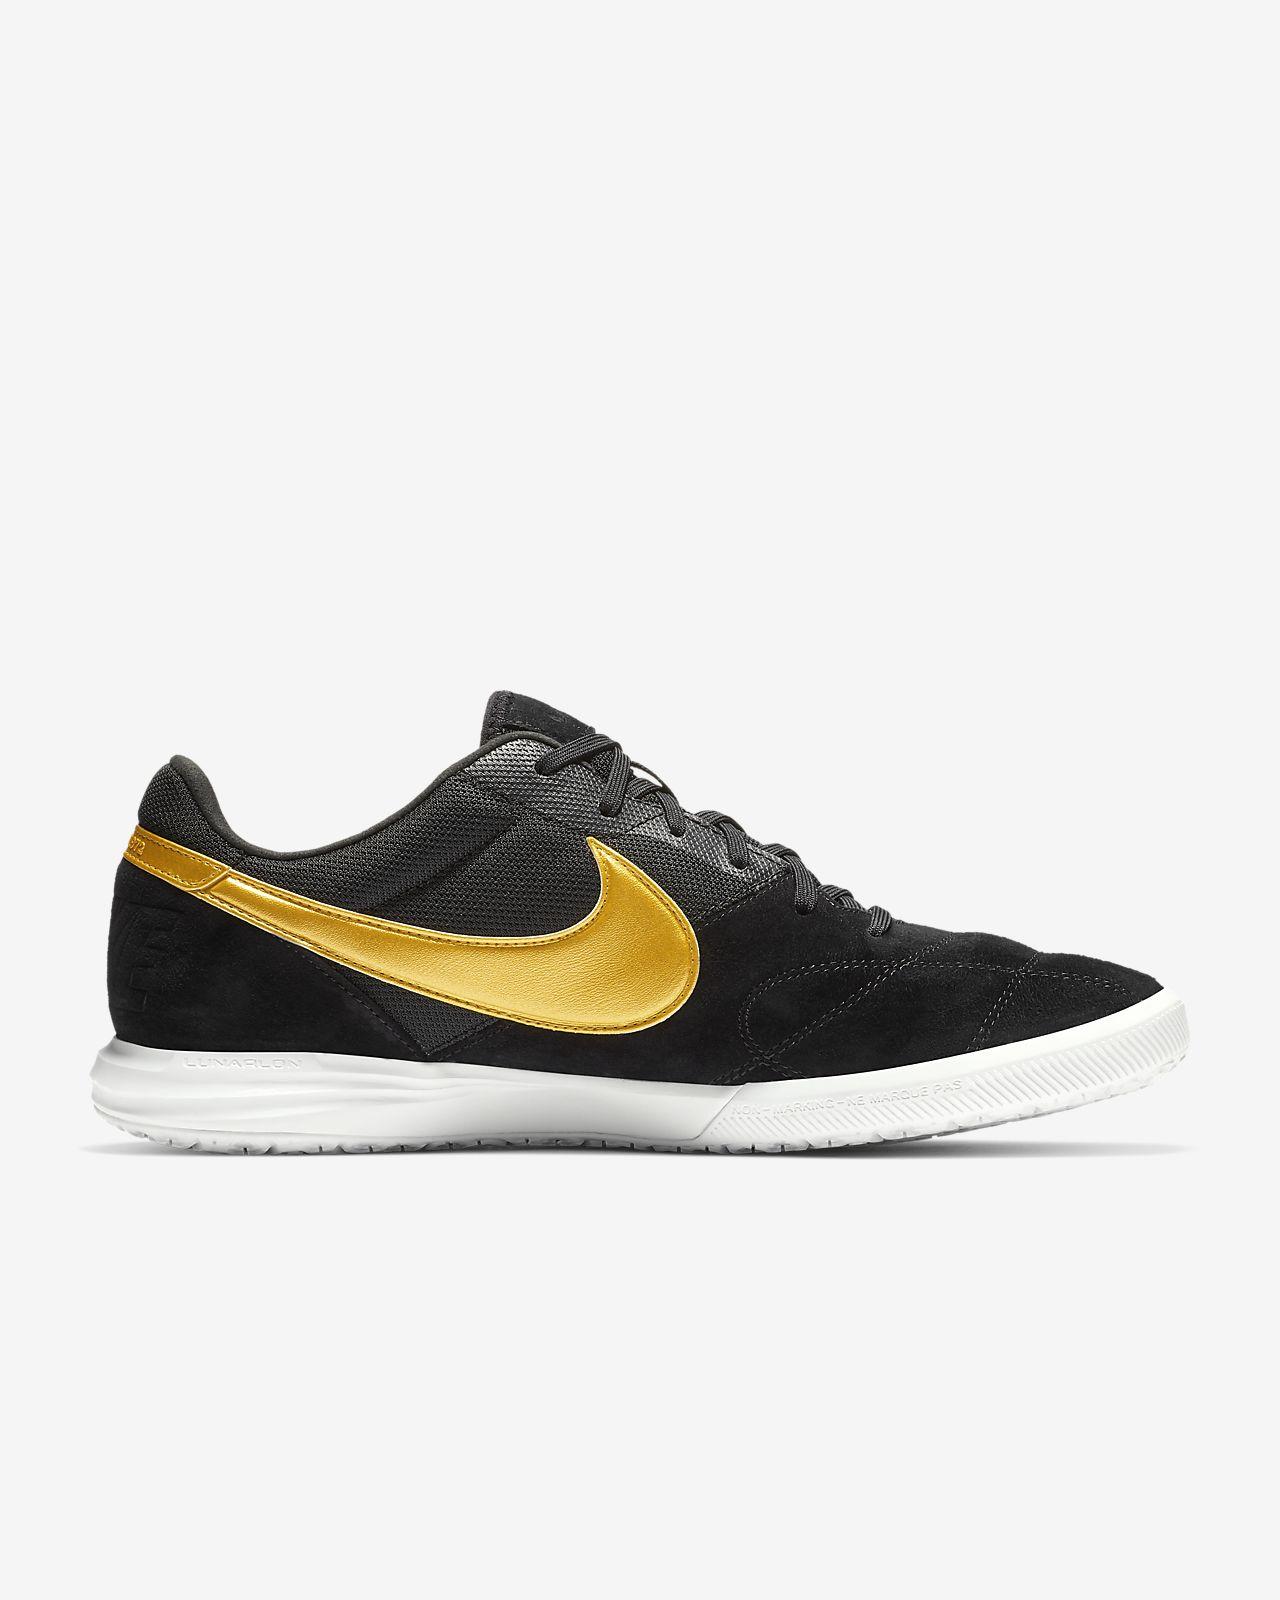 87a2933c9f3e5 Nike Tiempo Premier II Sala Botas de fútbol sala. Nike.com ES